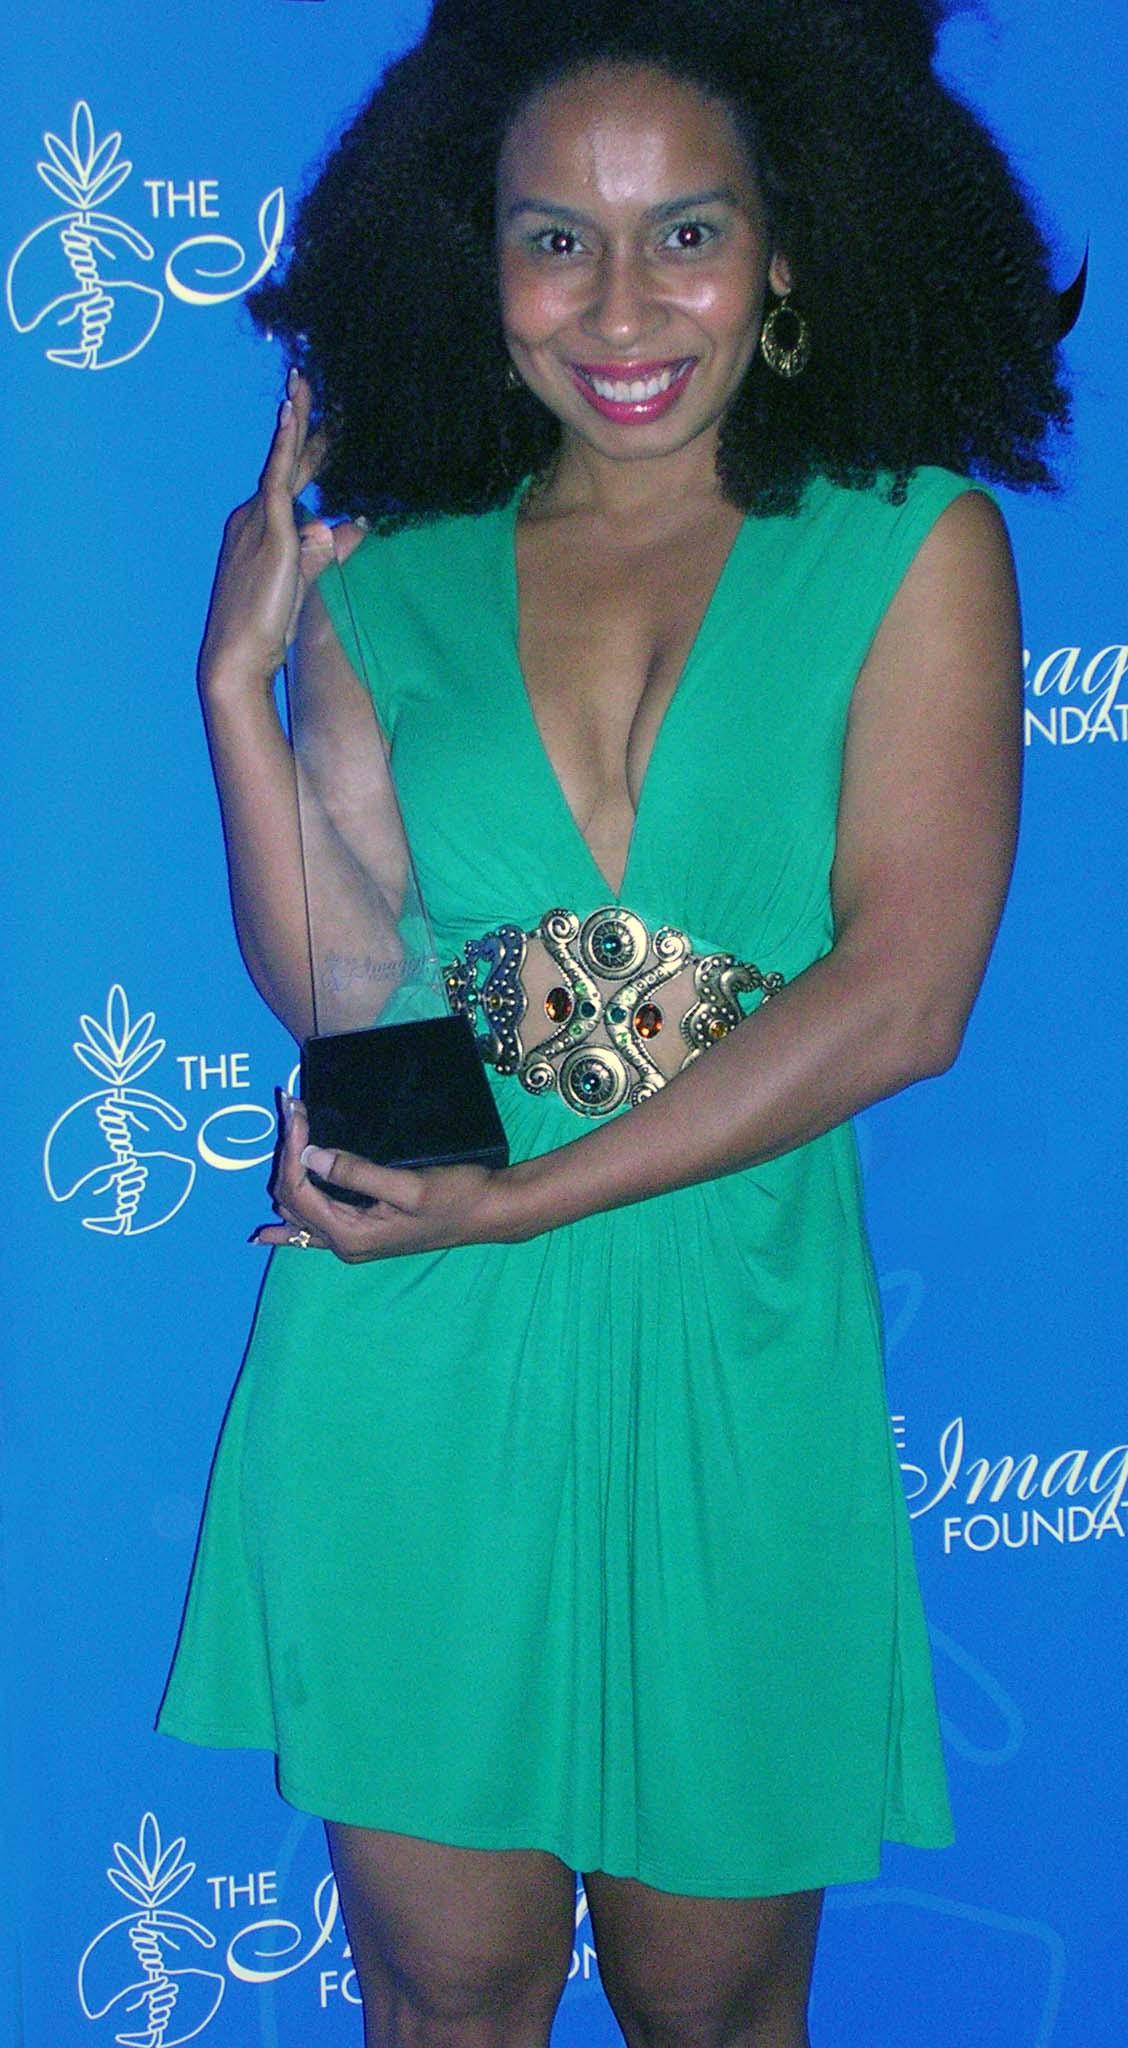 Maria Costa Imagen Award